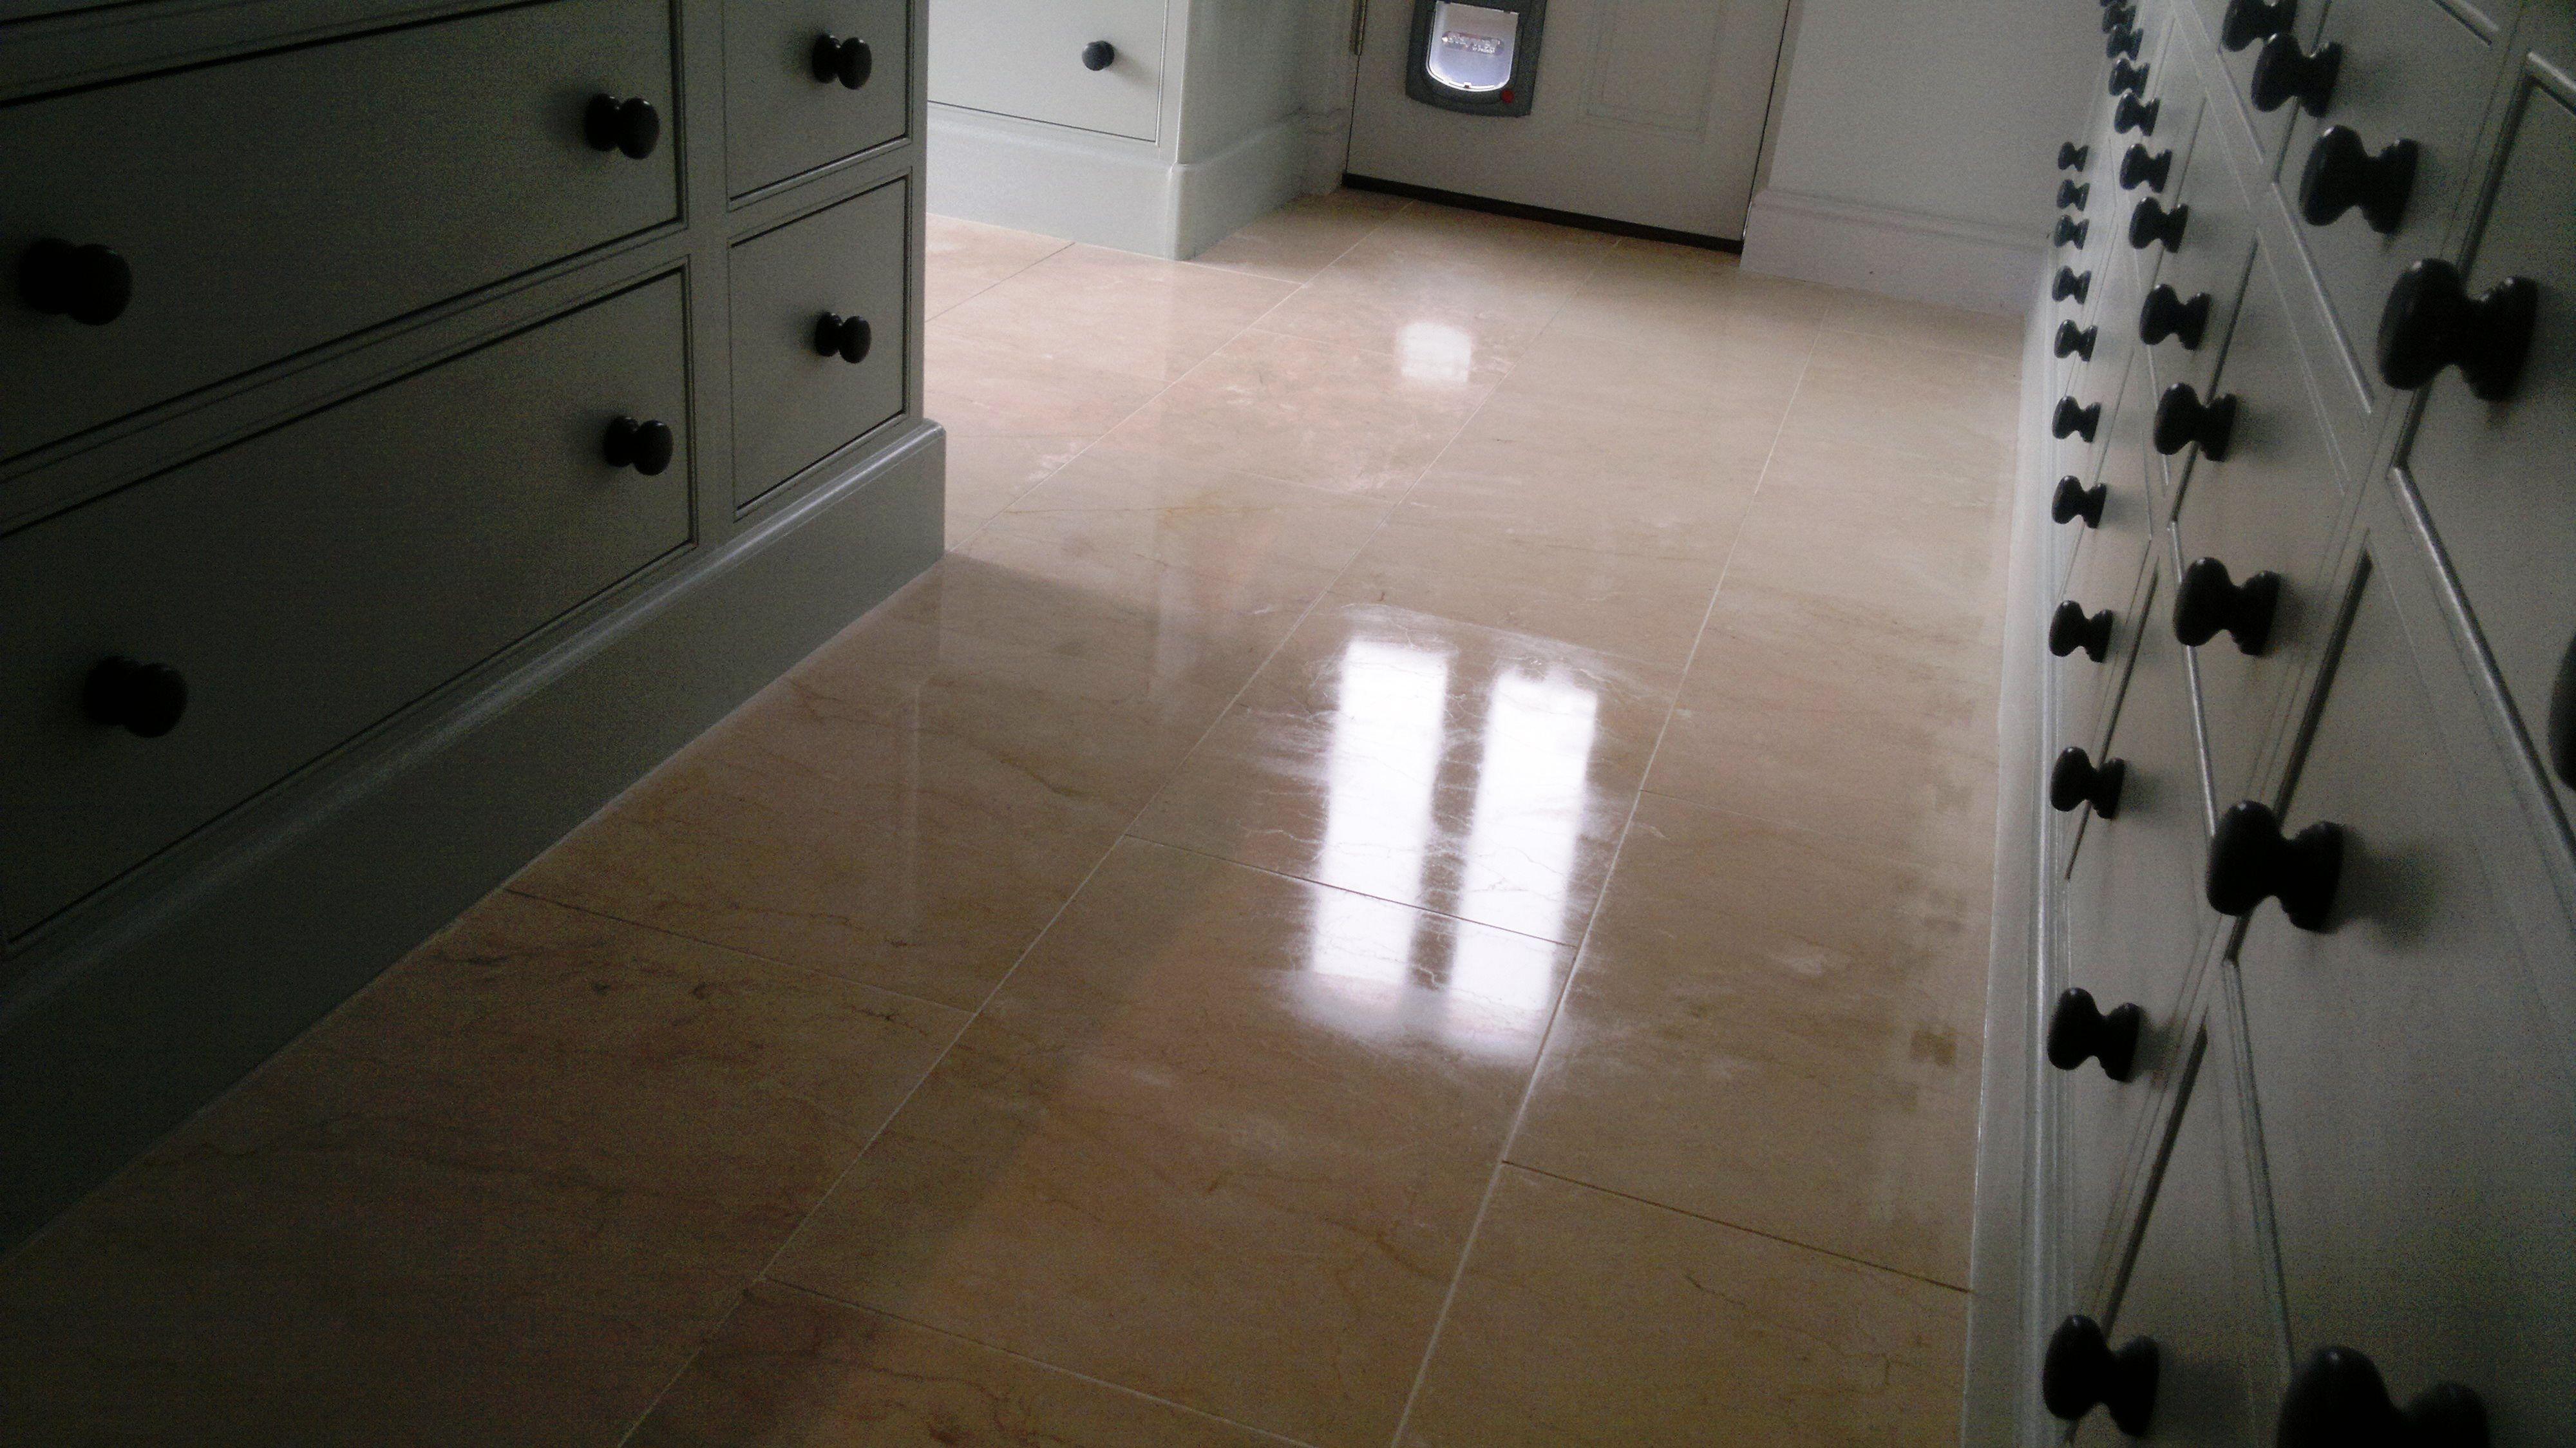 Porcelain floor tile grout sealer httpnextsoft21 porcelain floor tile grout sealer dailygadgetfo Images